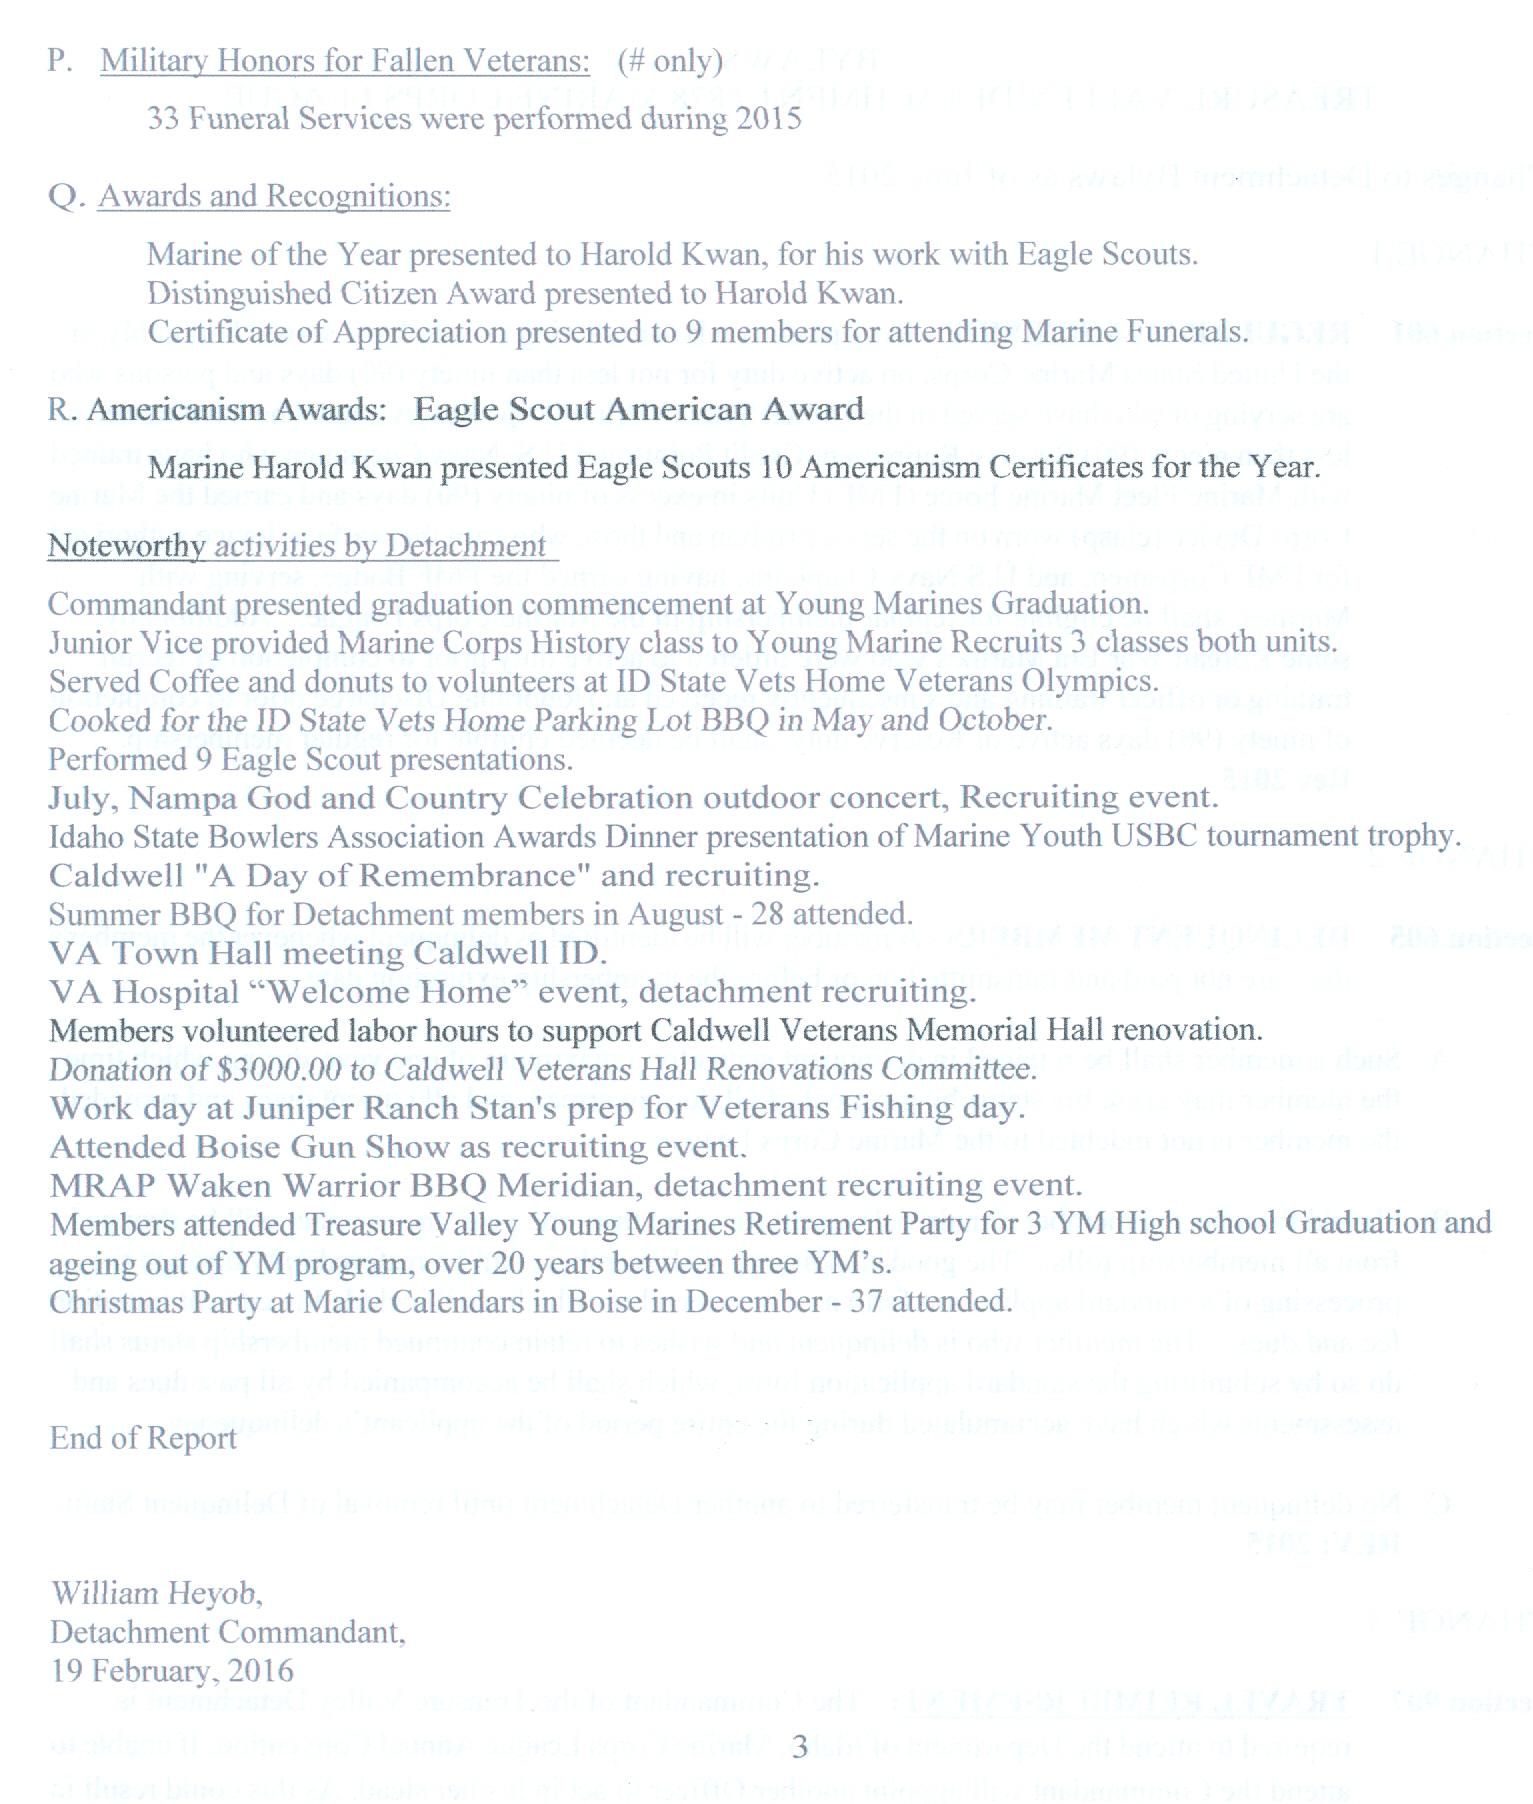 2015 Annual Activities Report-3